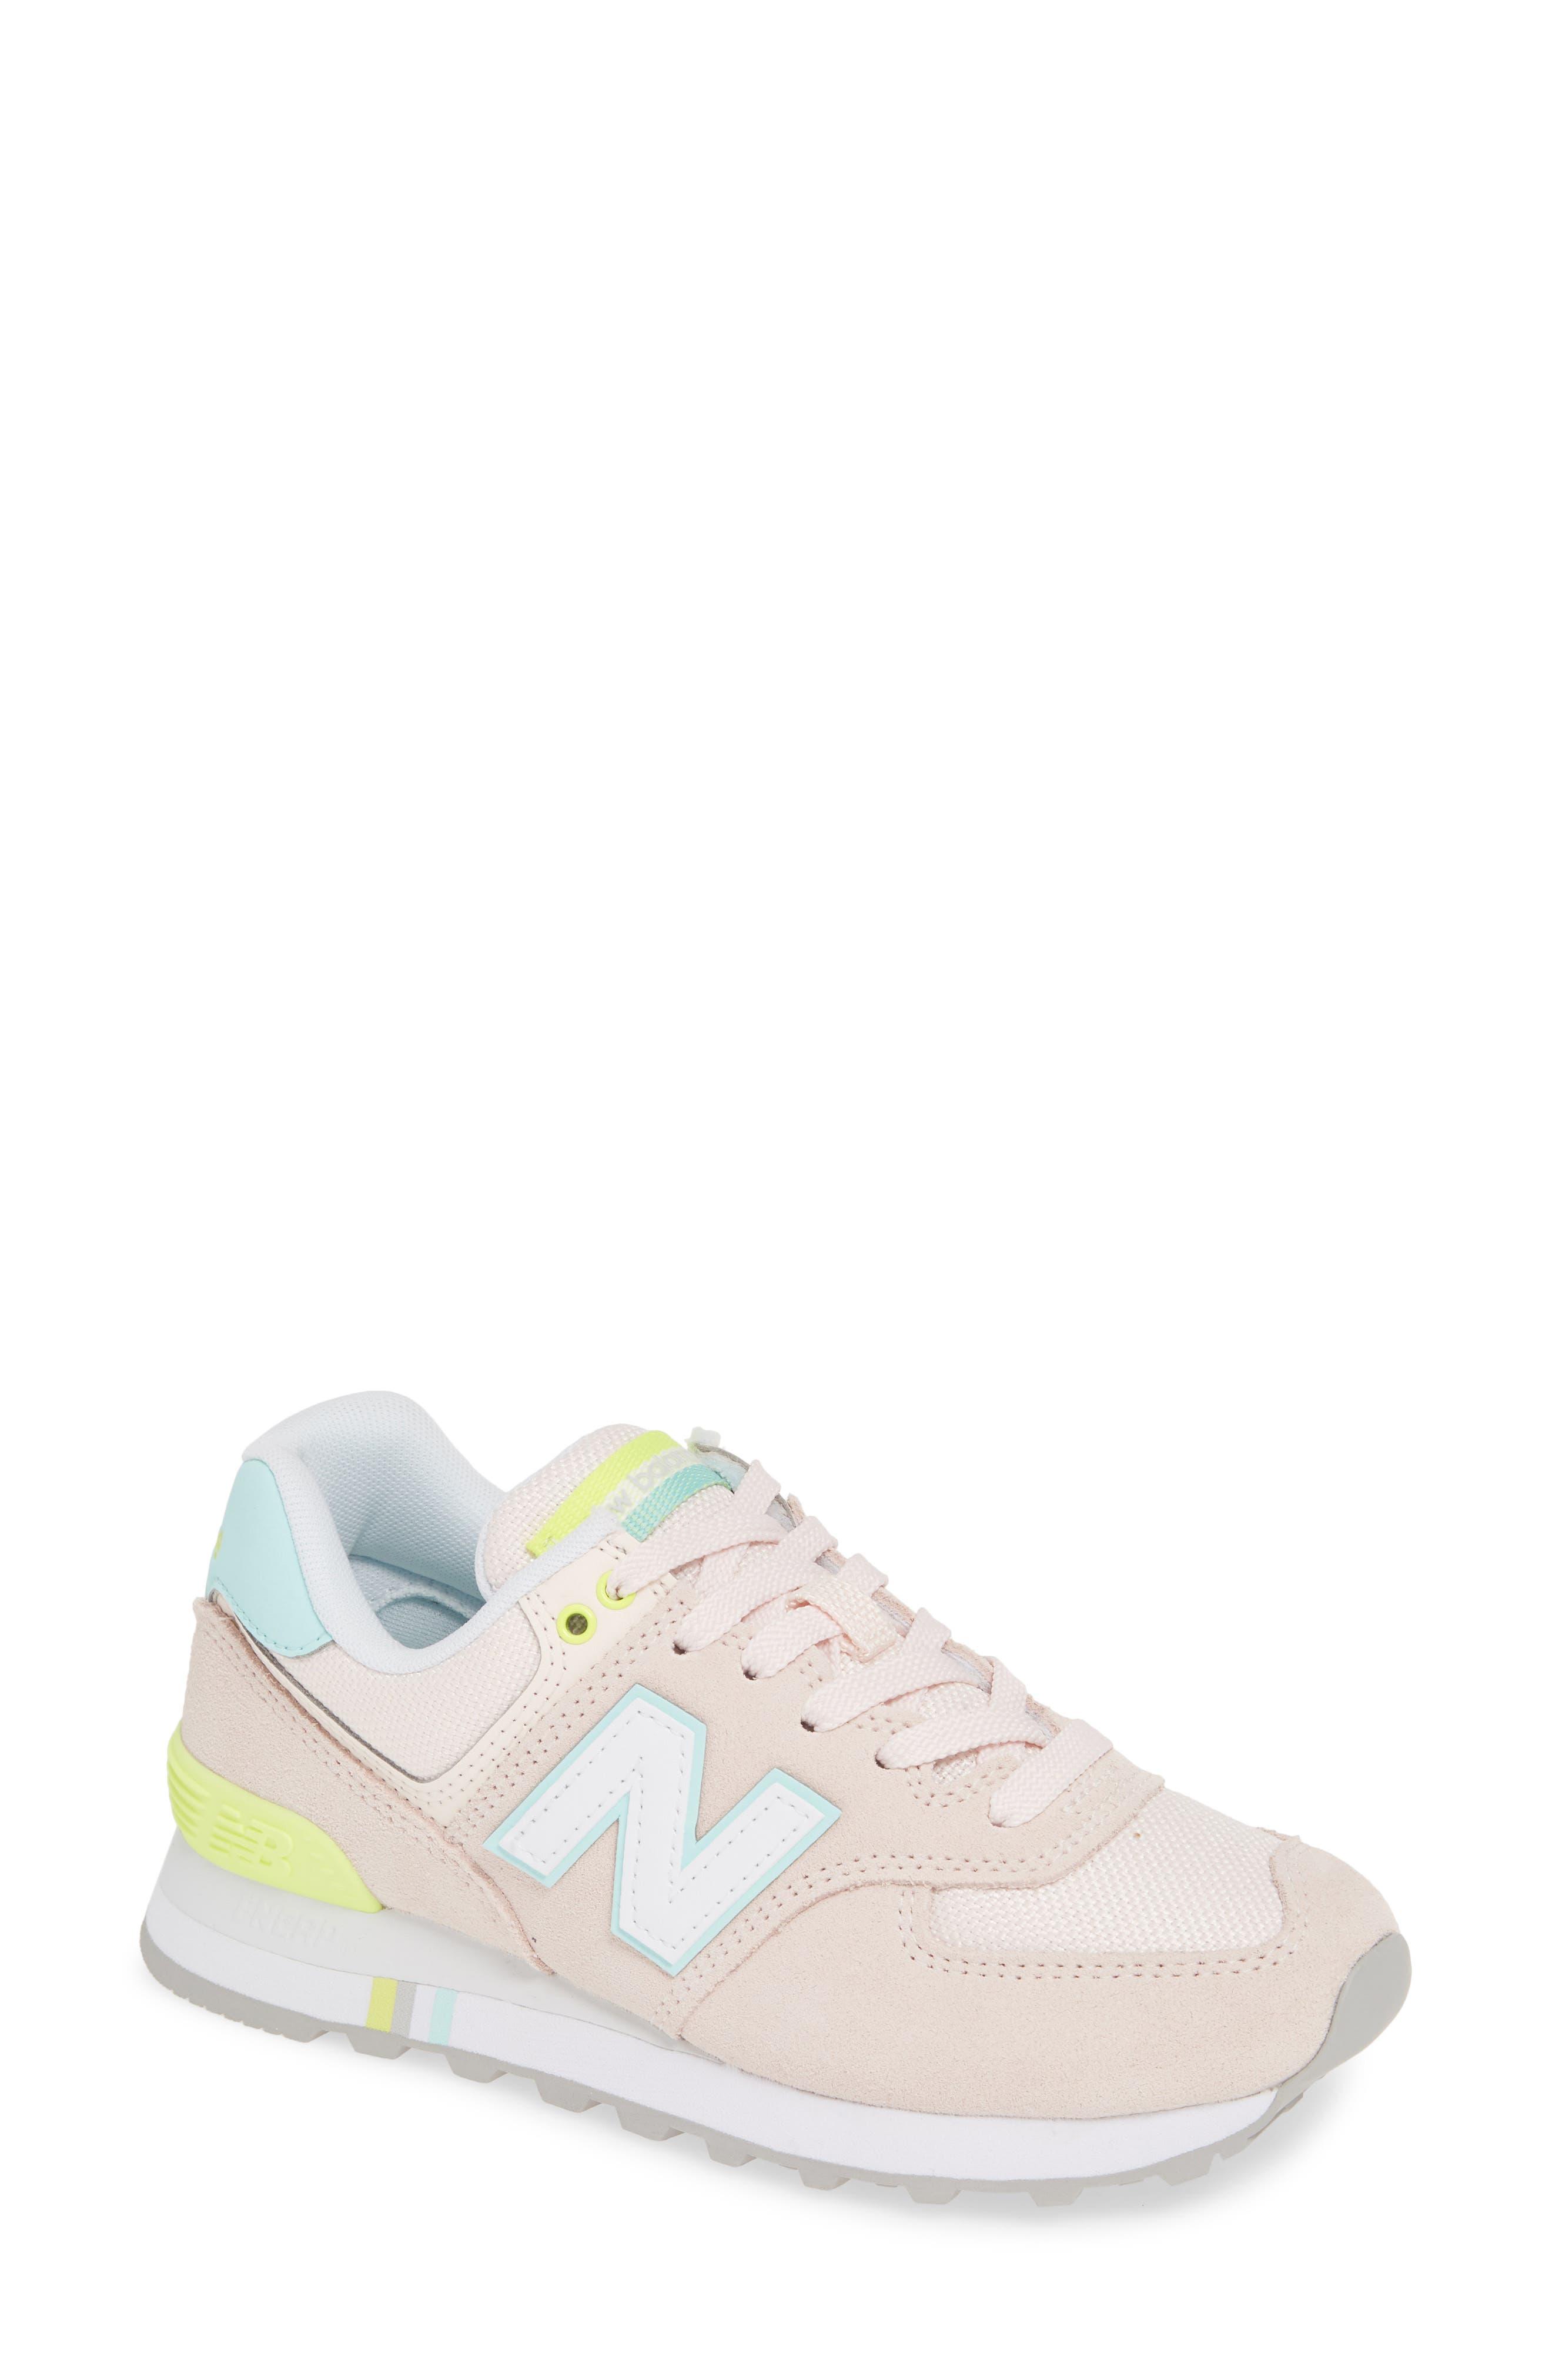 New Balance 574 Sneaker B - Beige